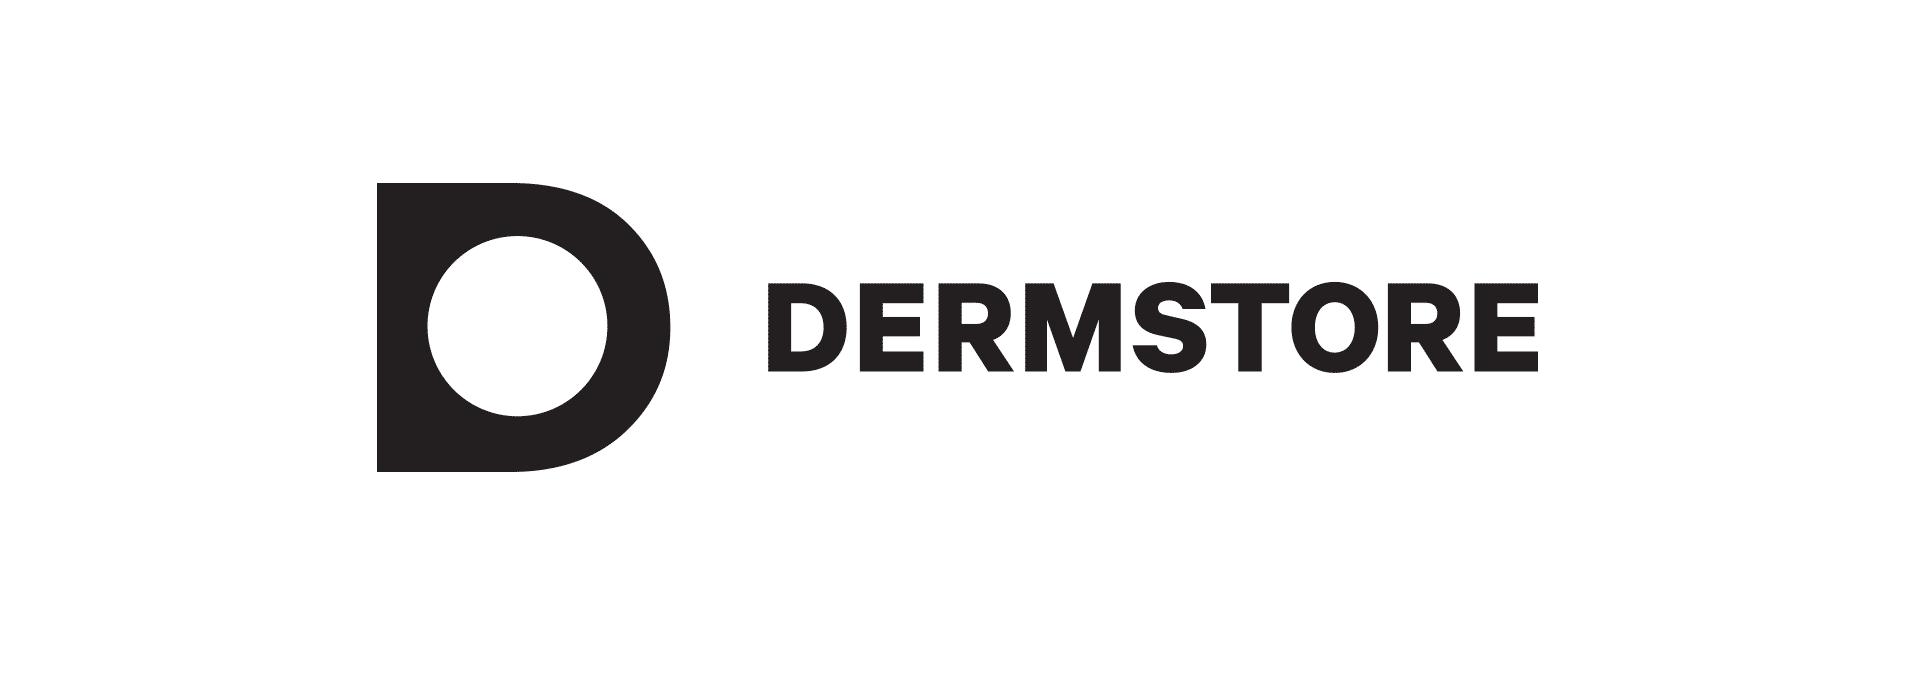 Dermstore-Horiz-logo